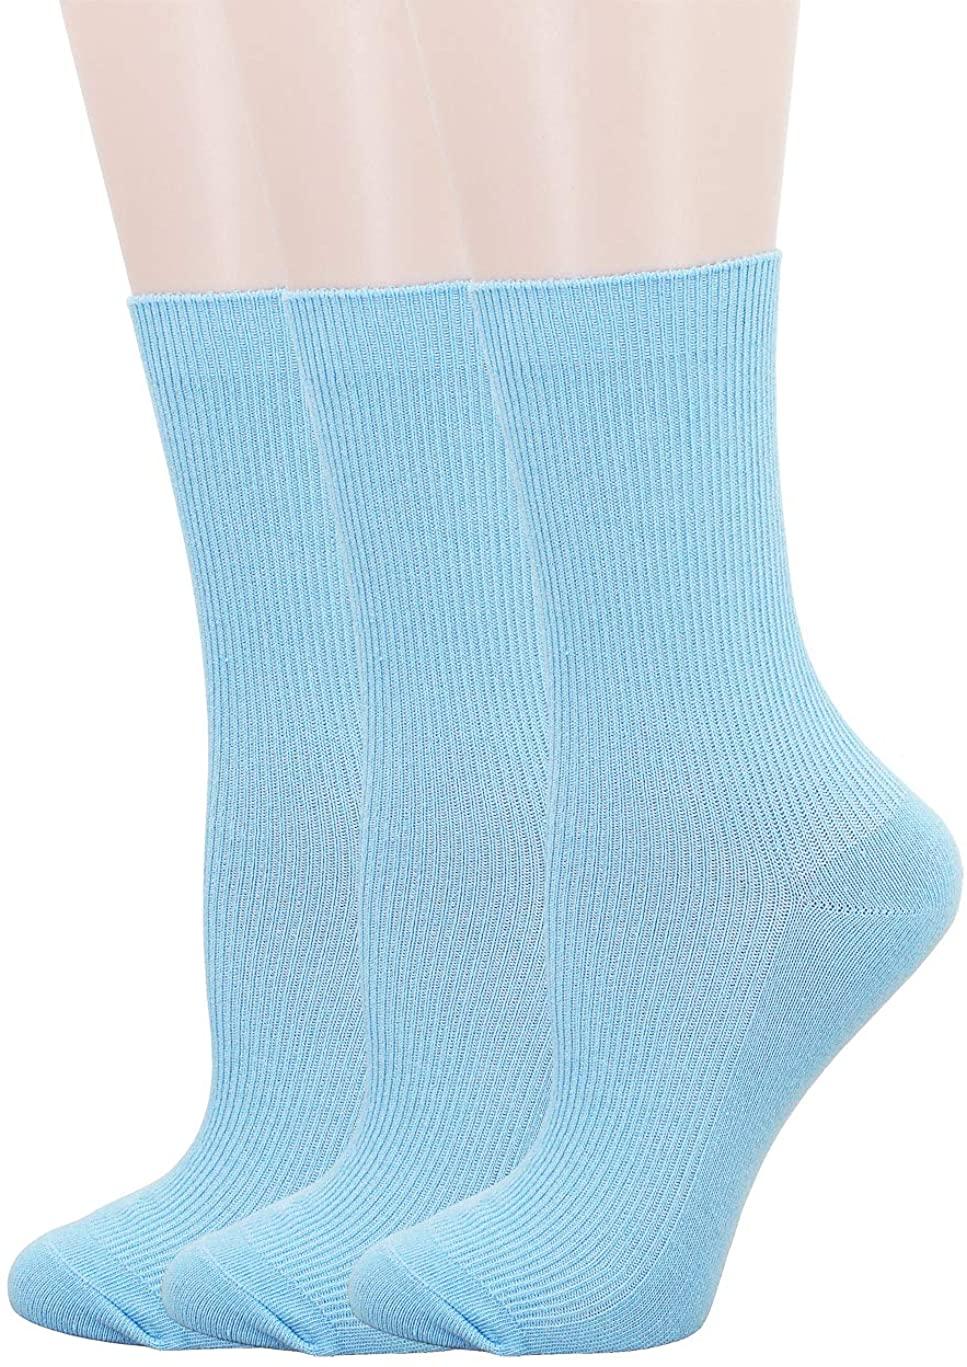 SRYL Womens Cotton Socks High Ankle